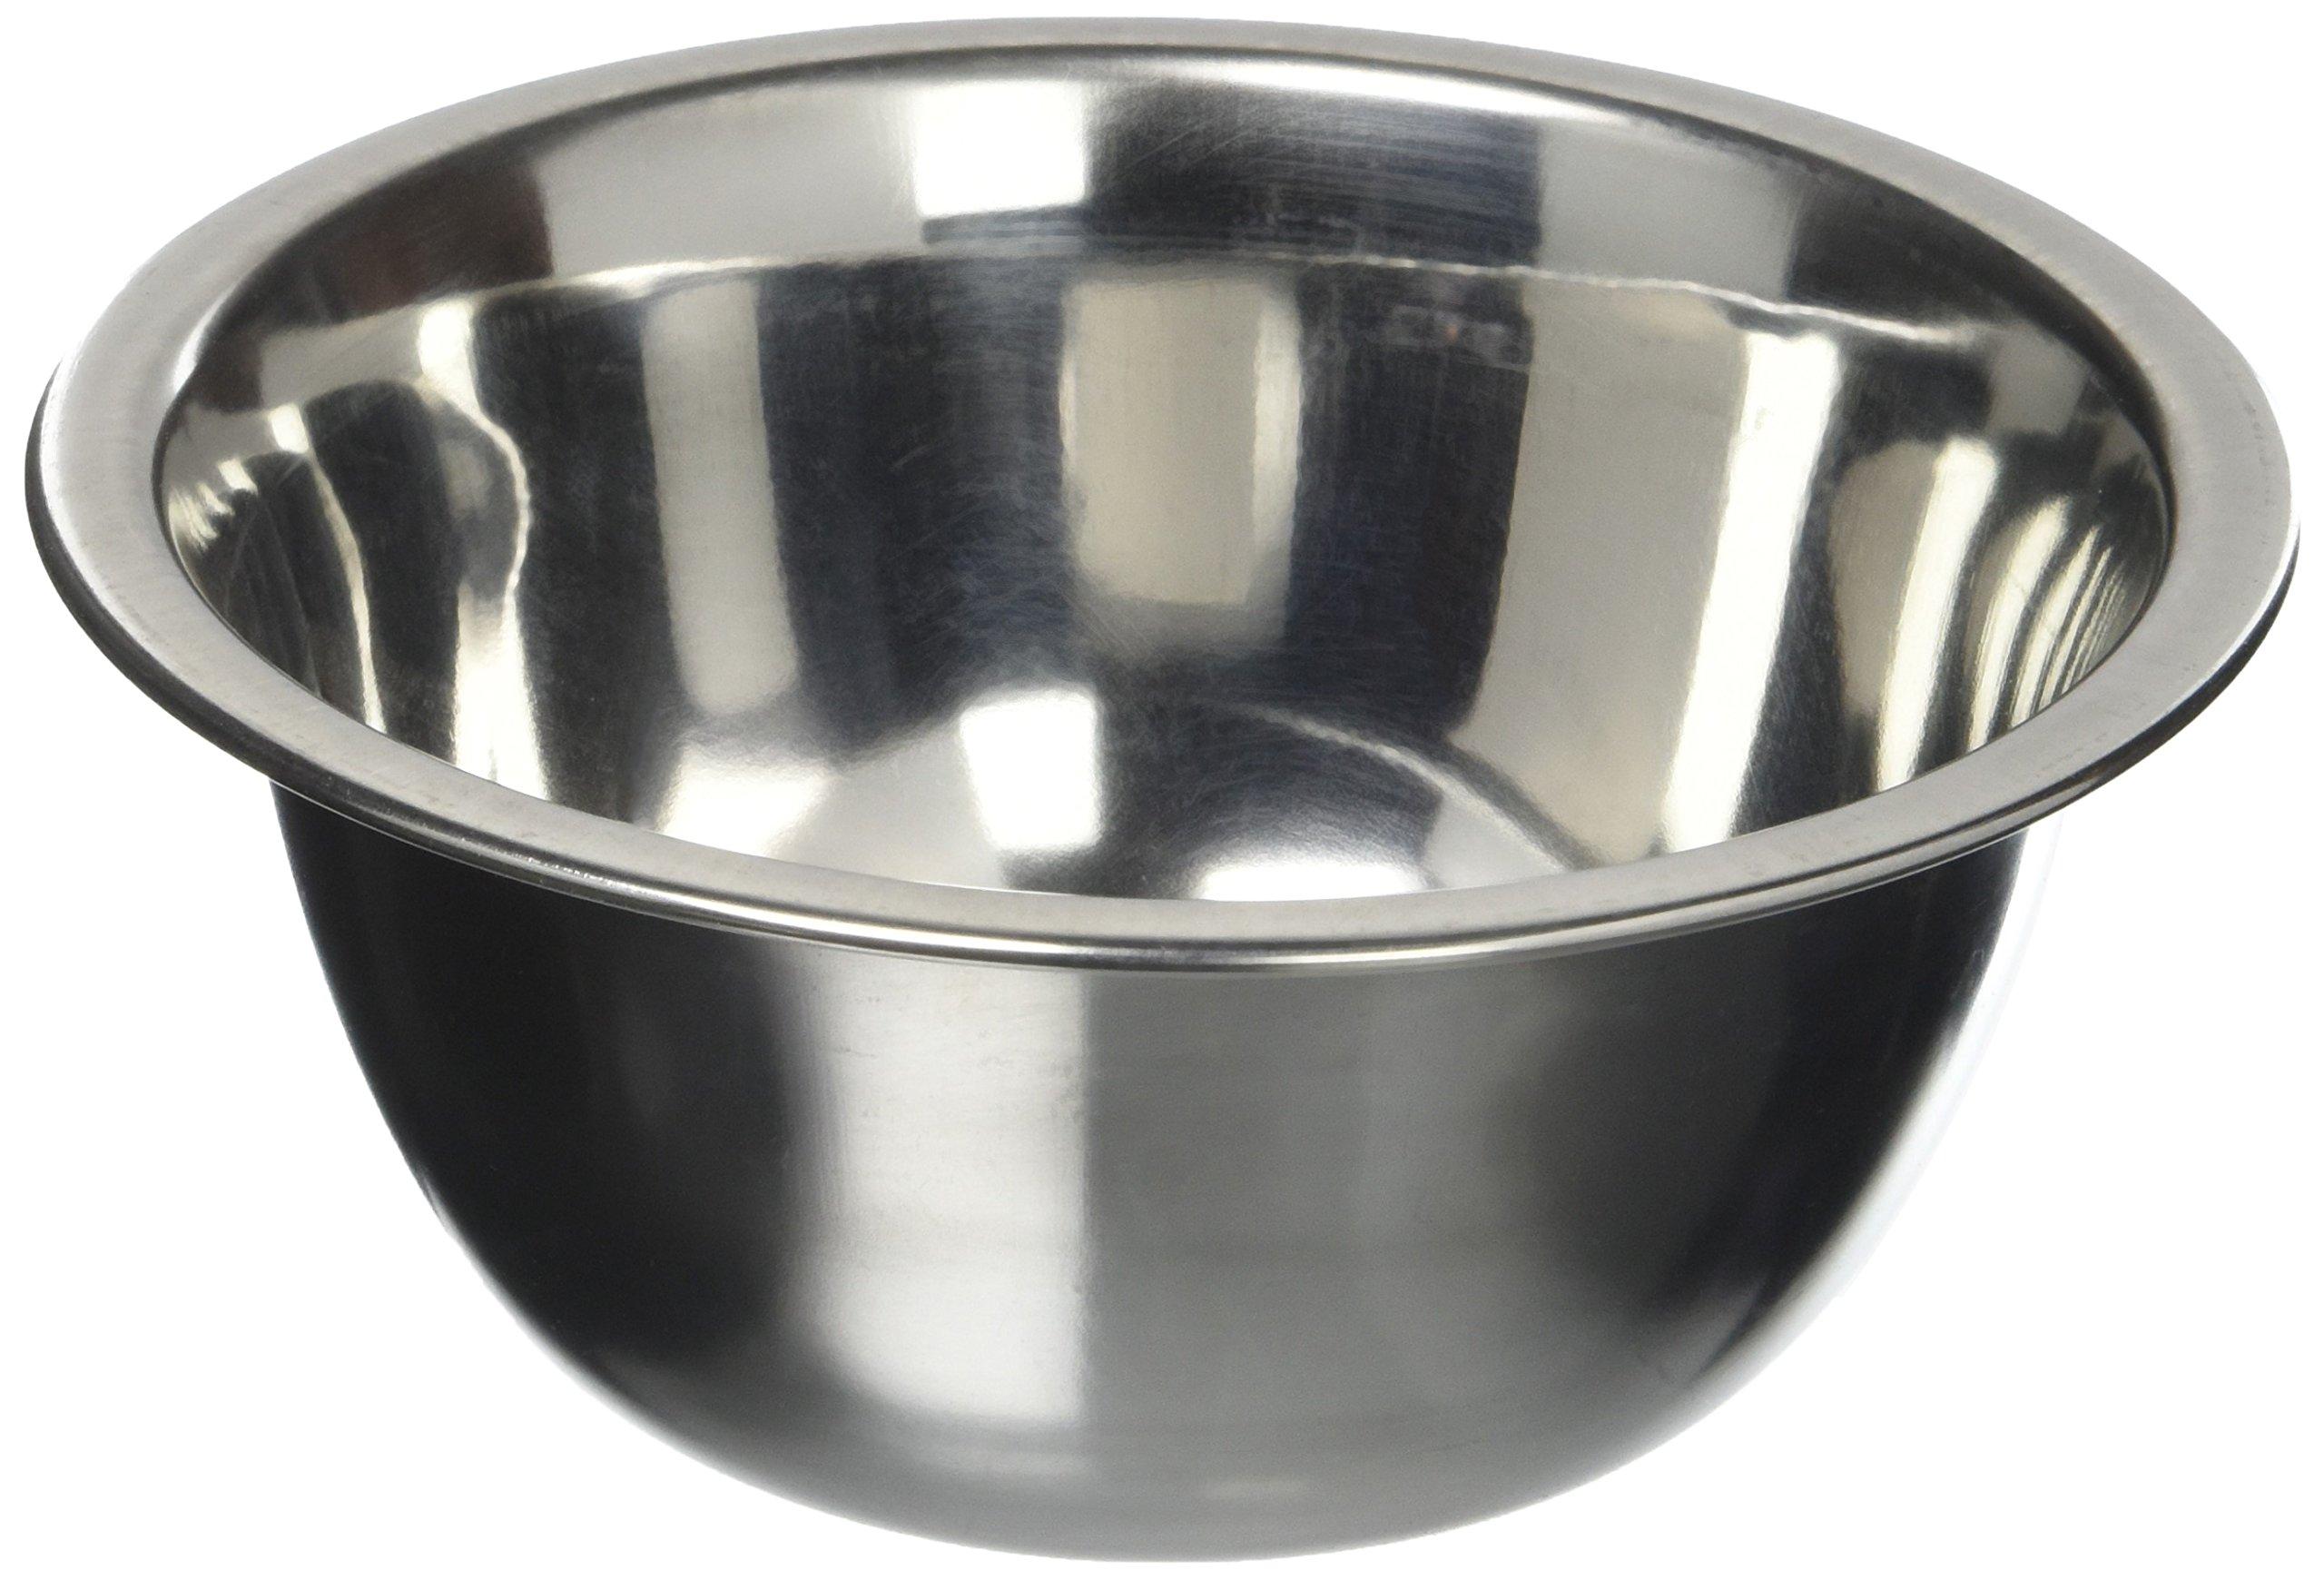 IBILI 710112 S/s bowl